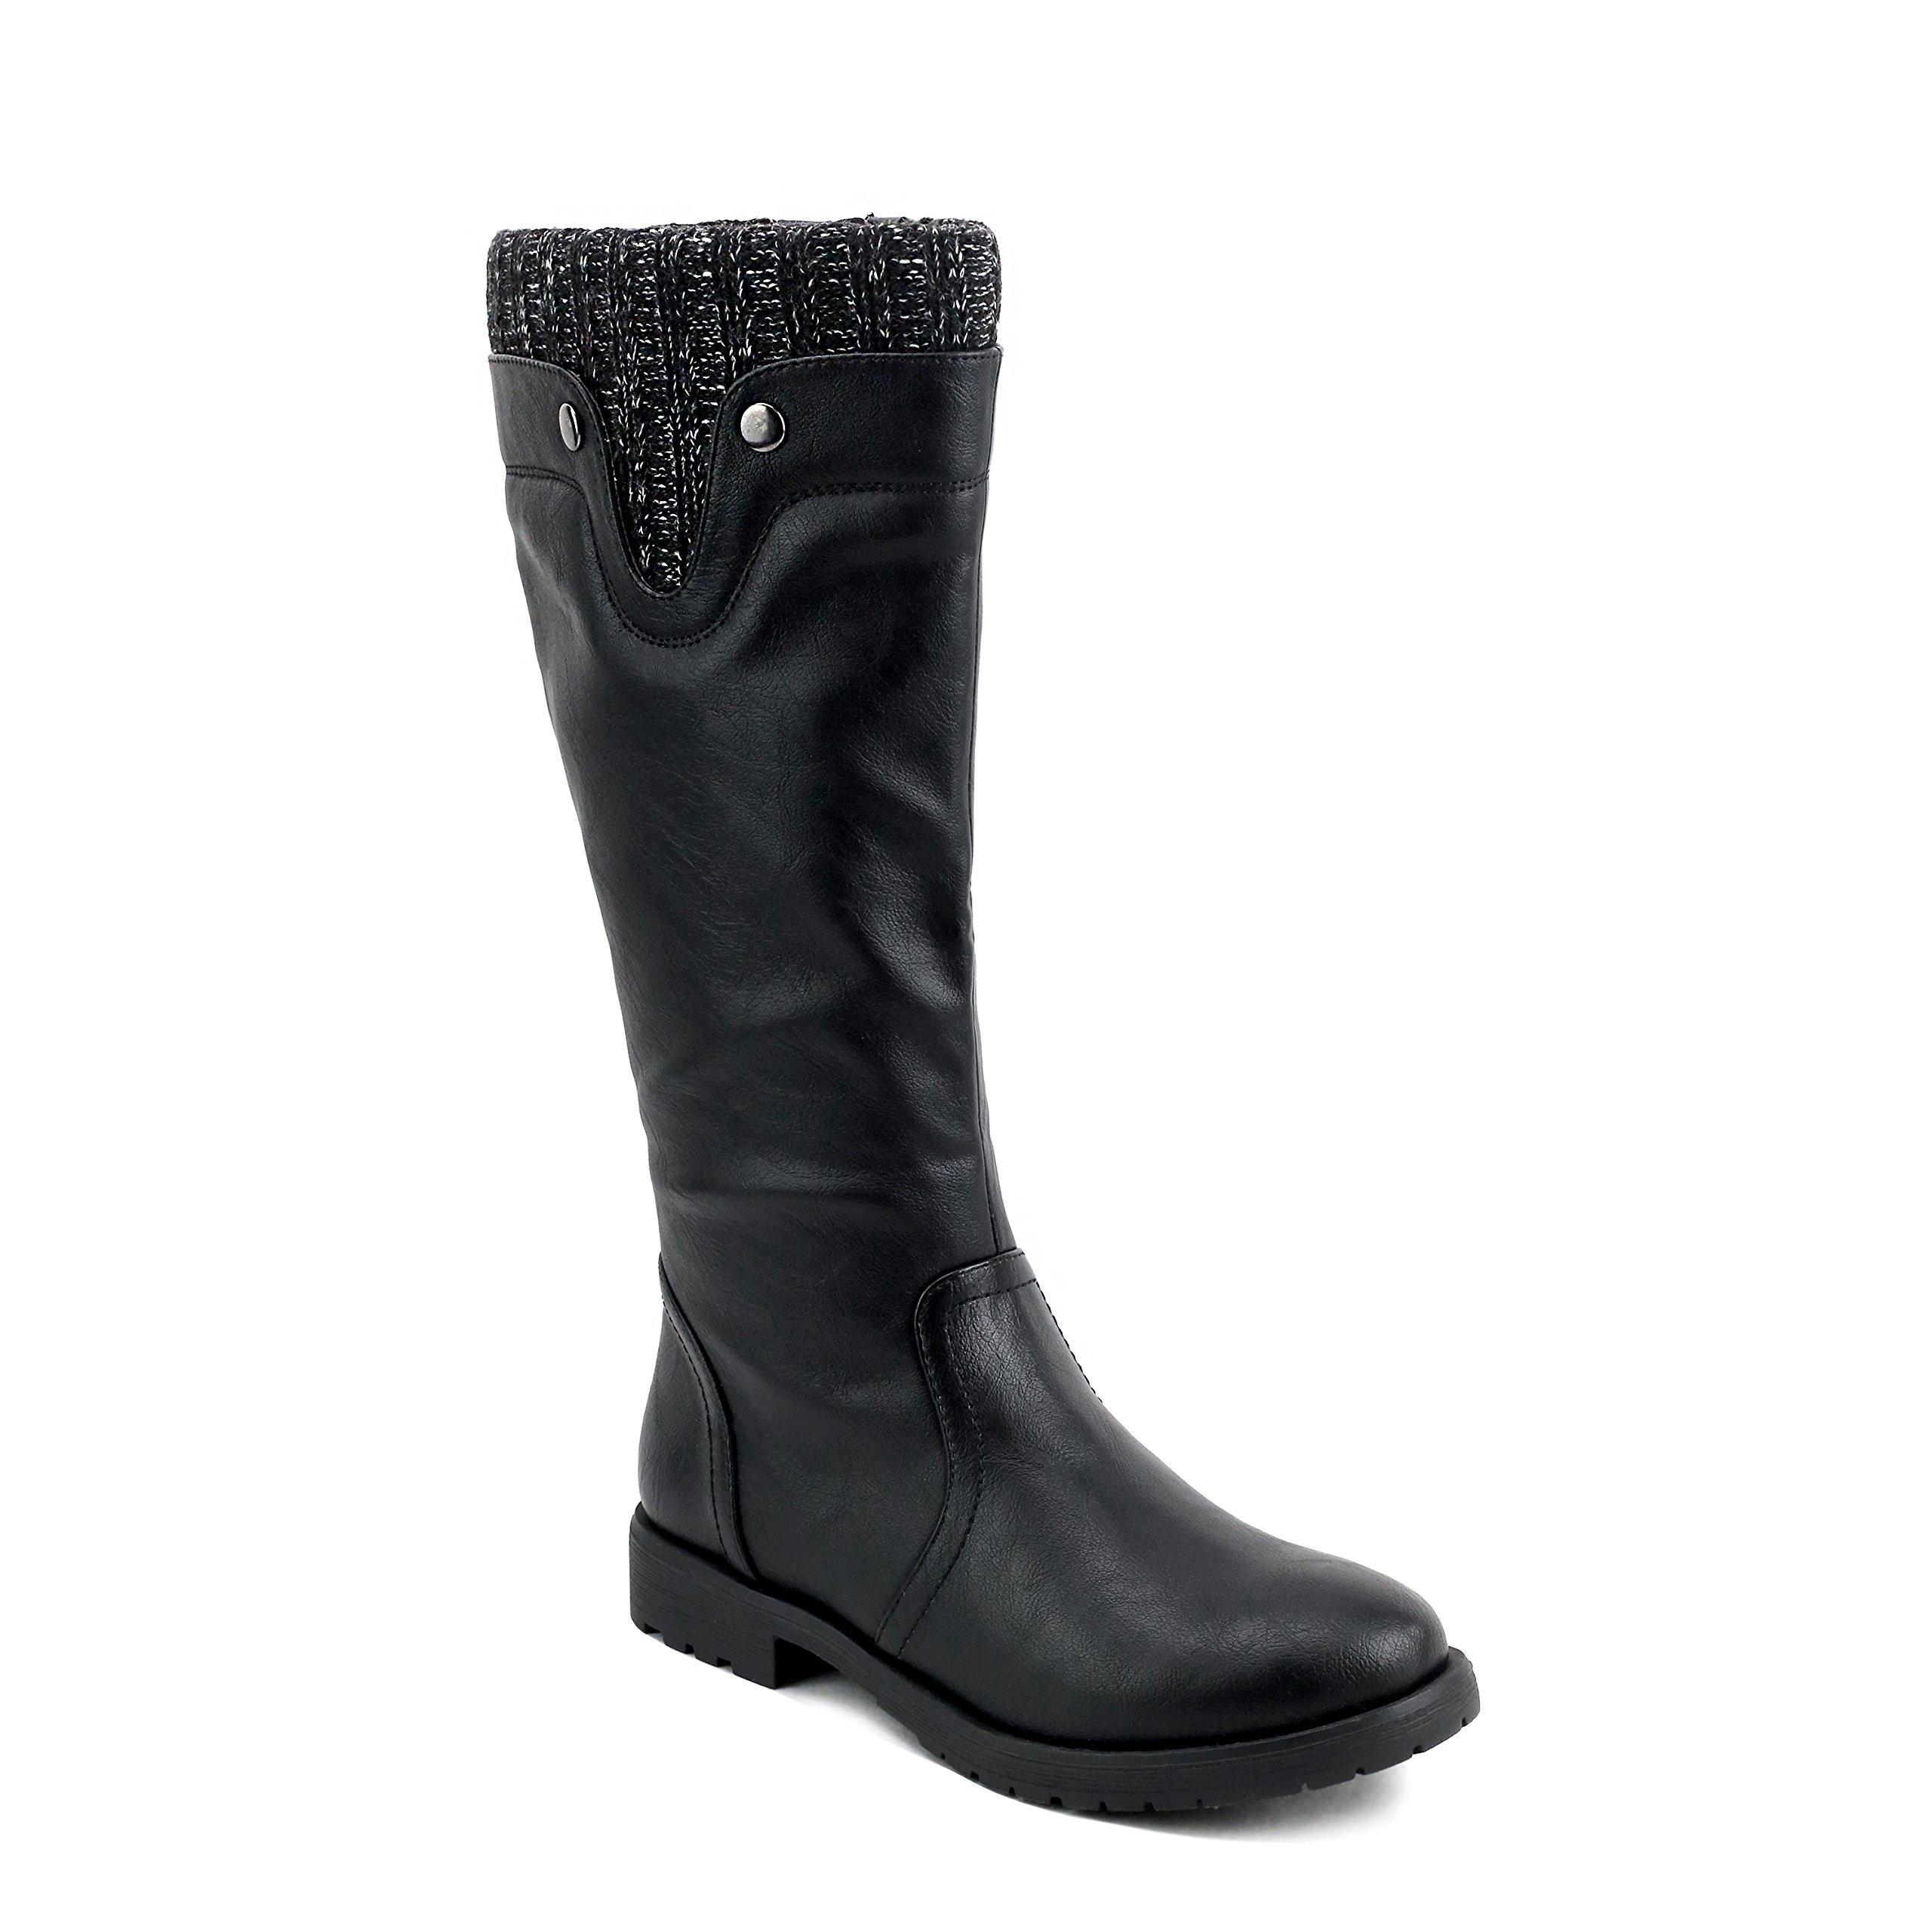 Olivia Miller 'Lenox' Black Sweater top Riding Boots 7 B(M) US